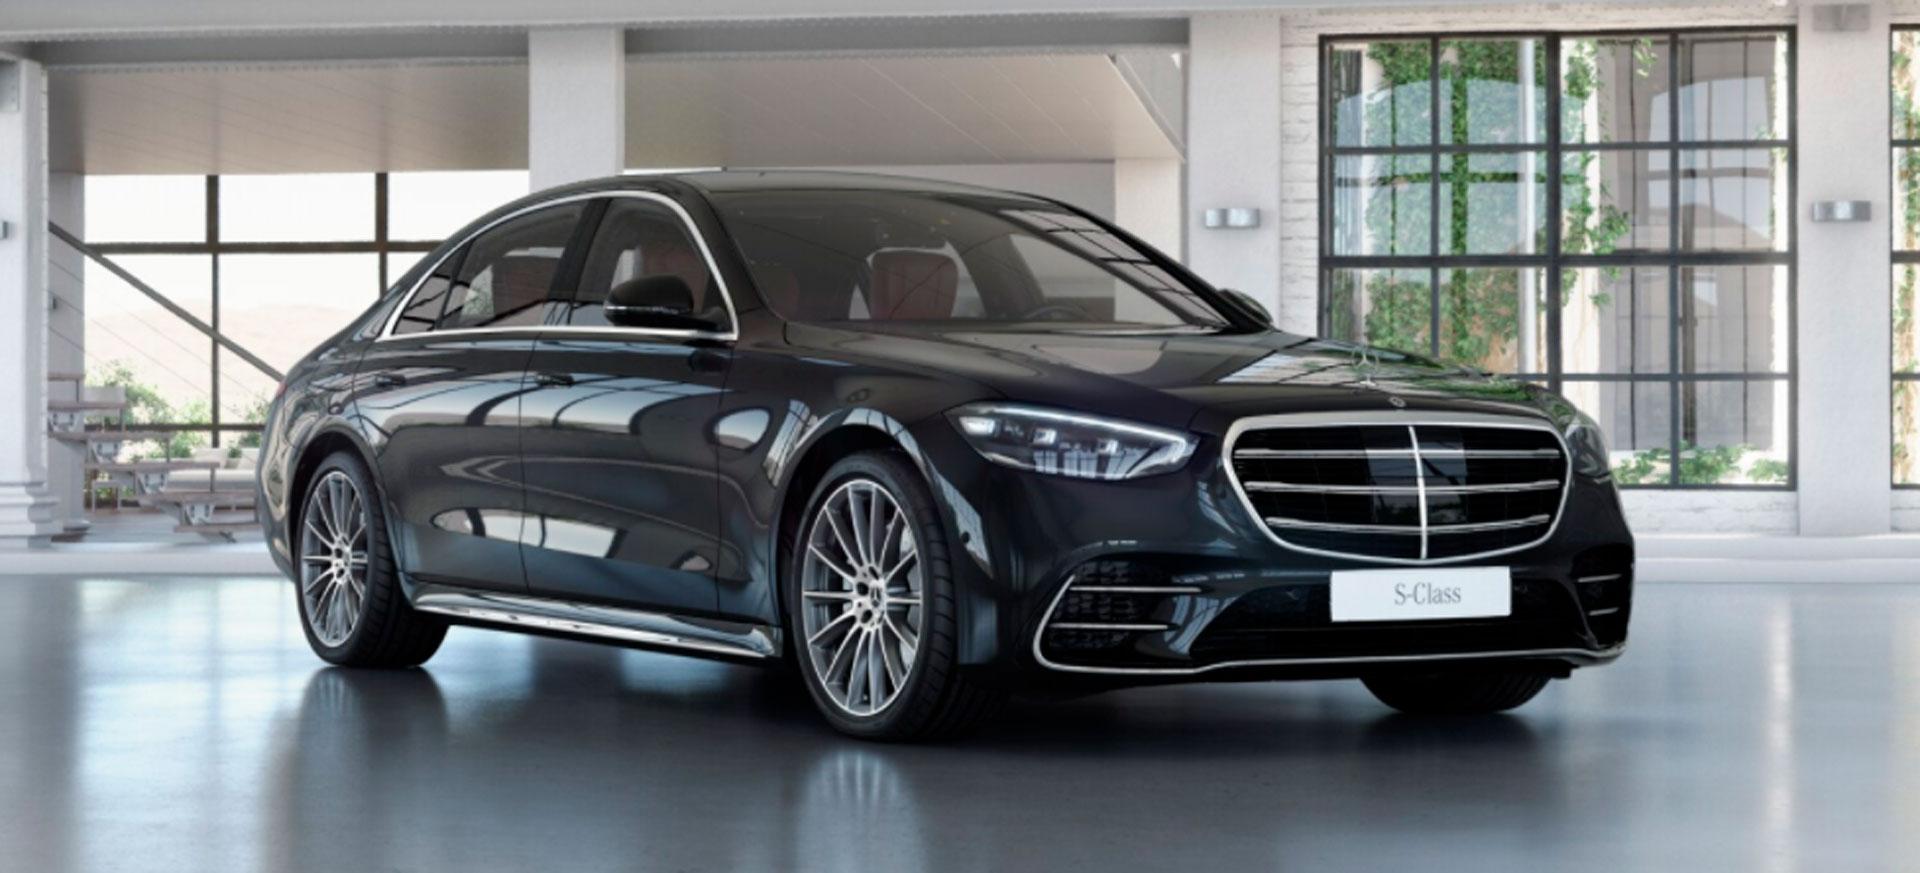 Mercedes-Benz S-Class Limousine 0052600319